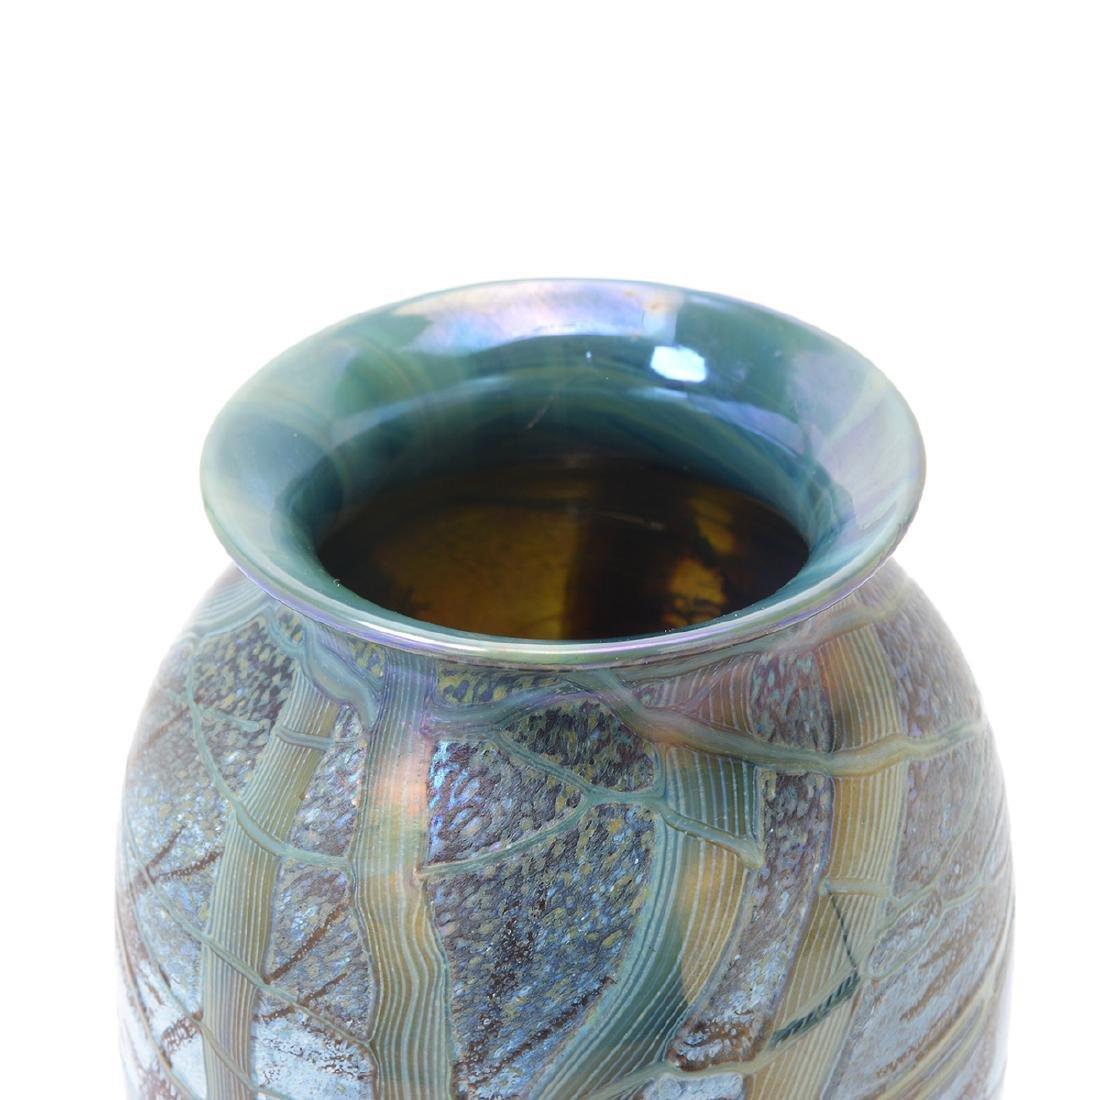 Two Richard Satava Art Glass Vases - Interior Lily and - 7